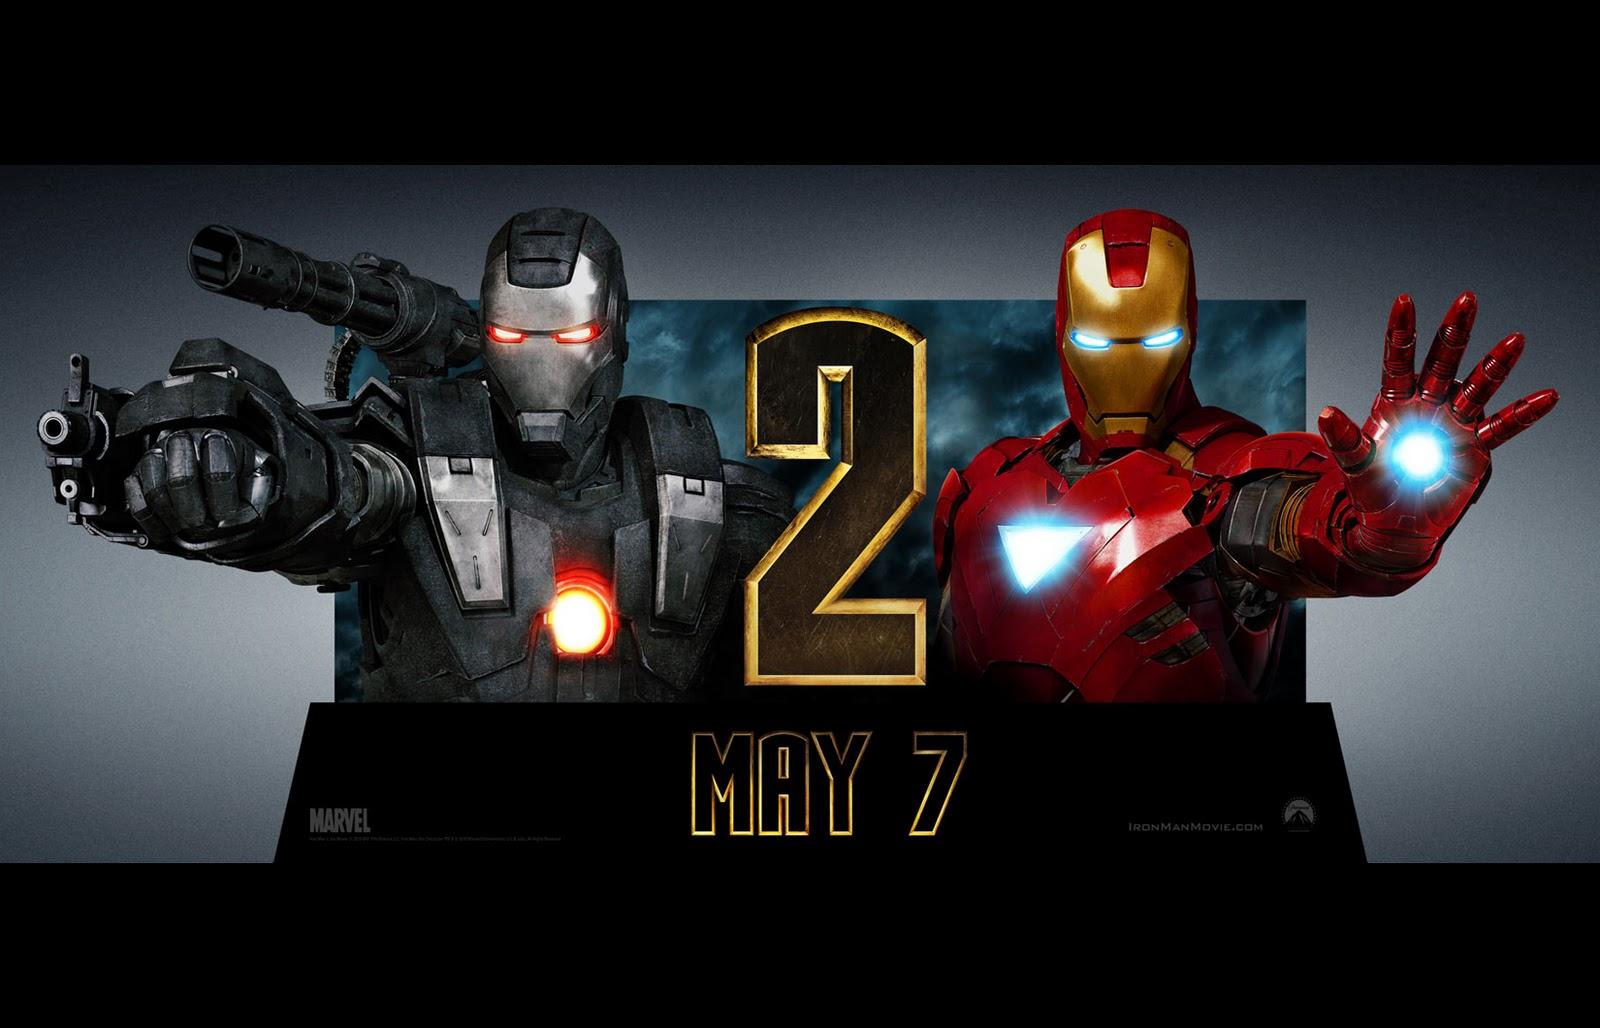 Iron Man 2 wallpaper 1600x1000 1600x1028